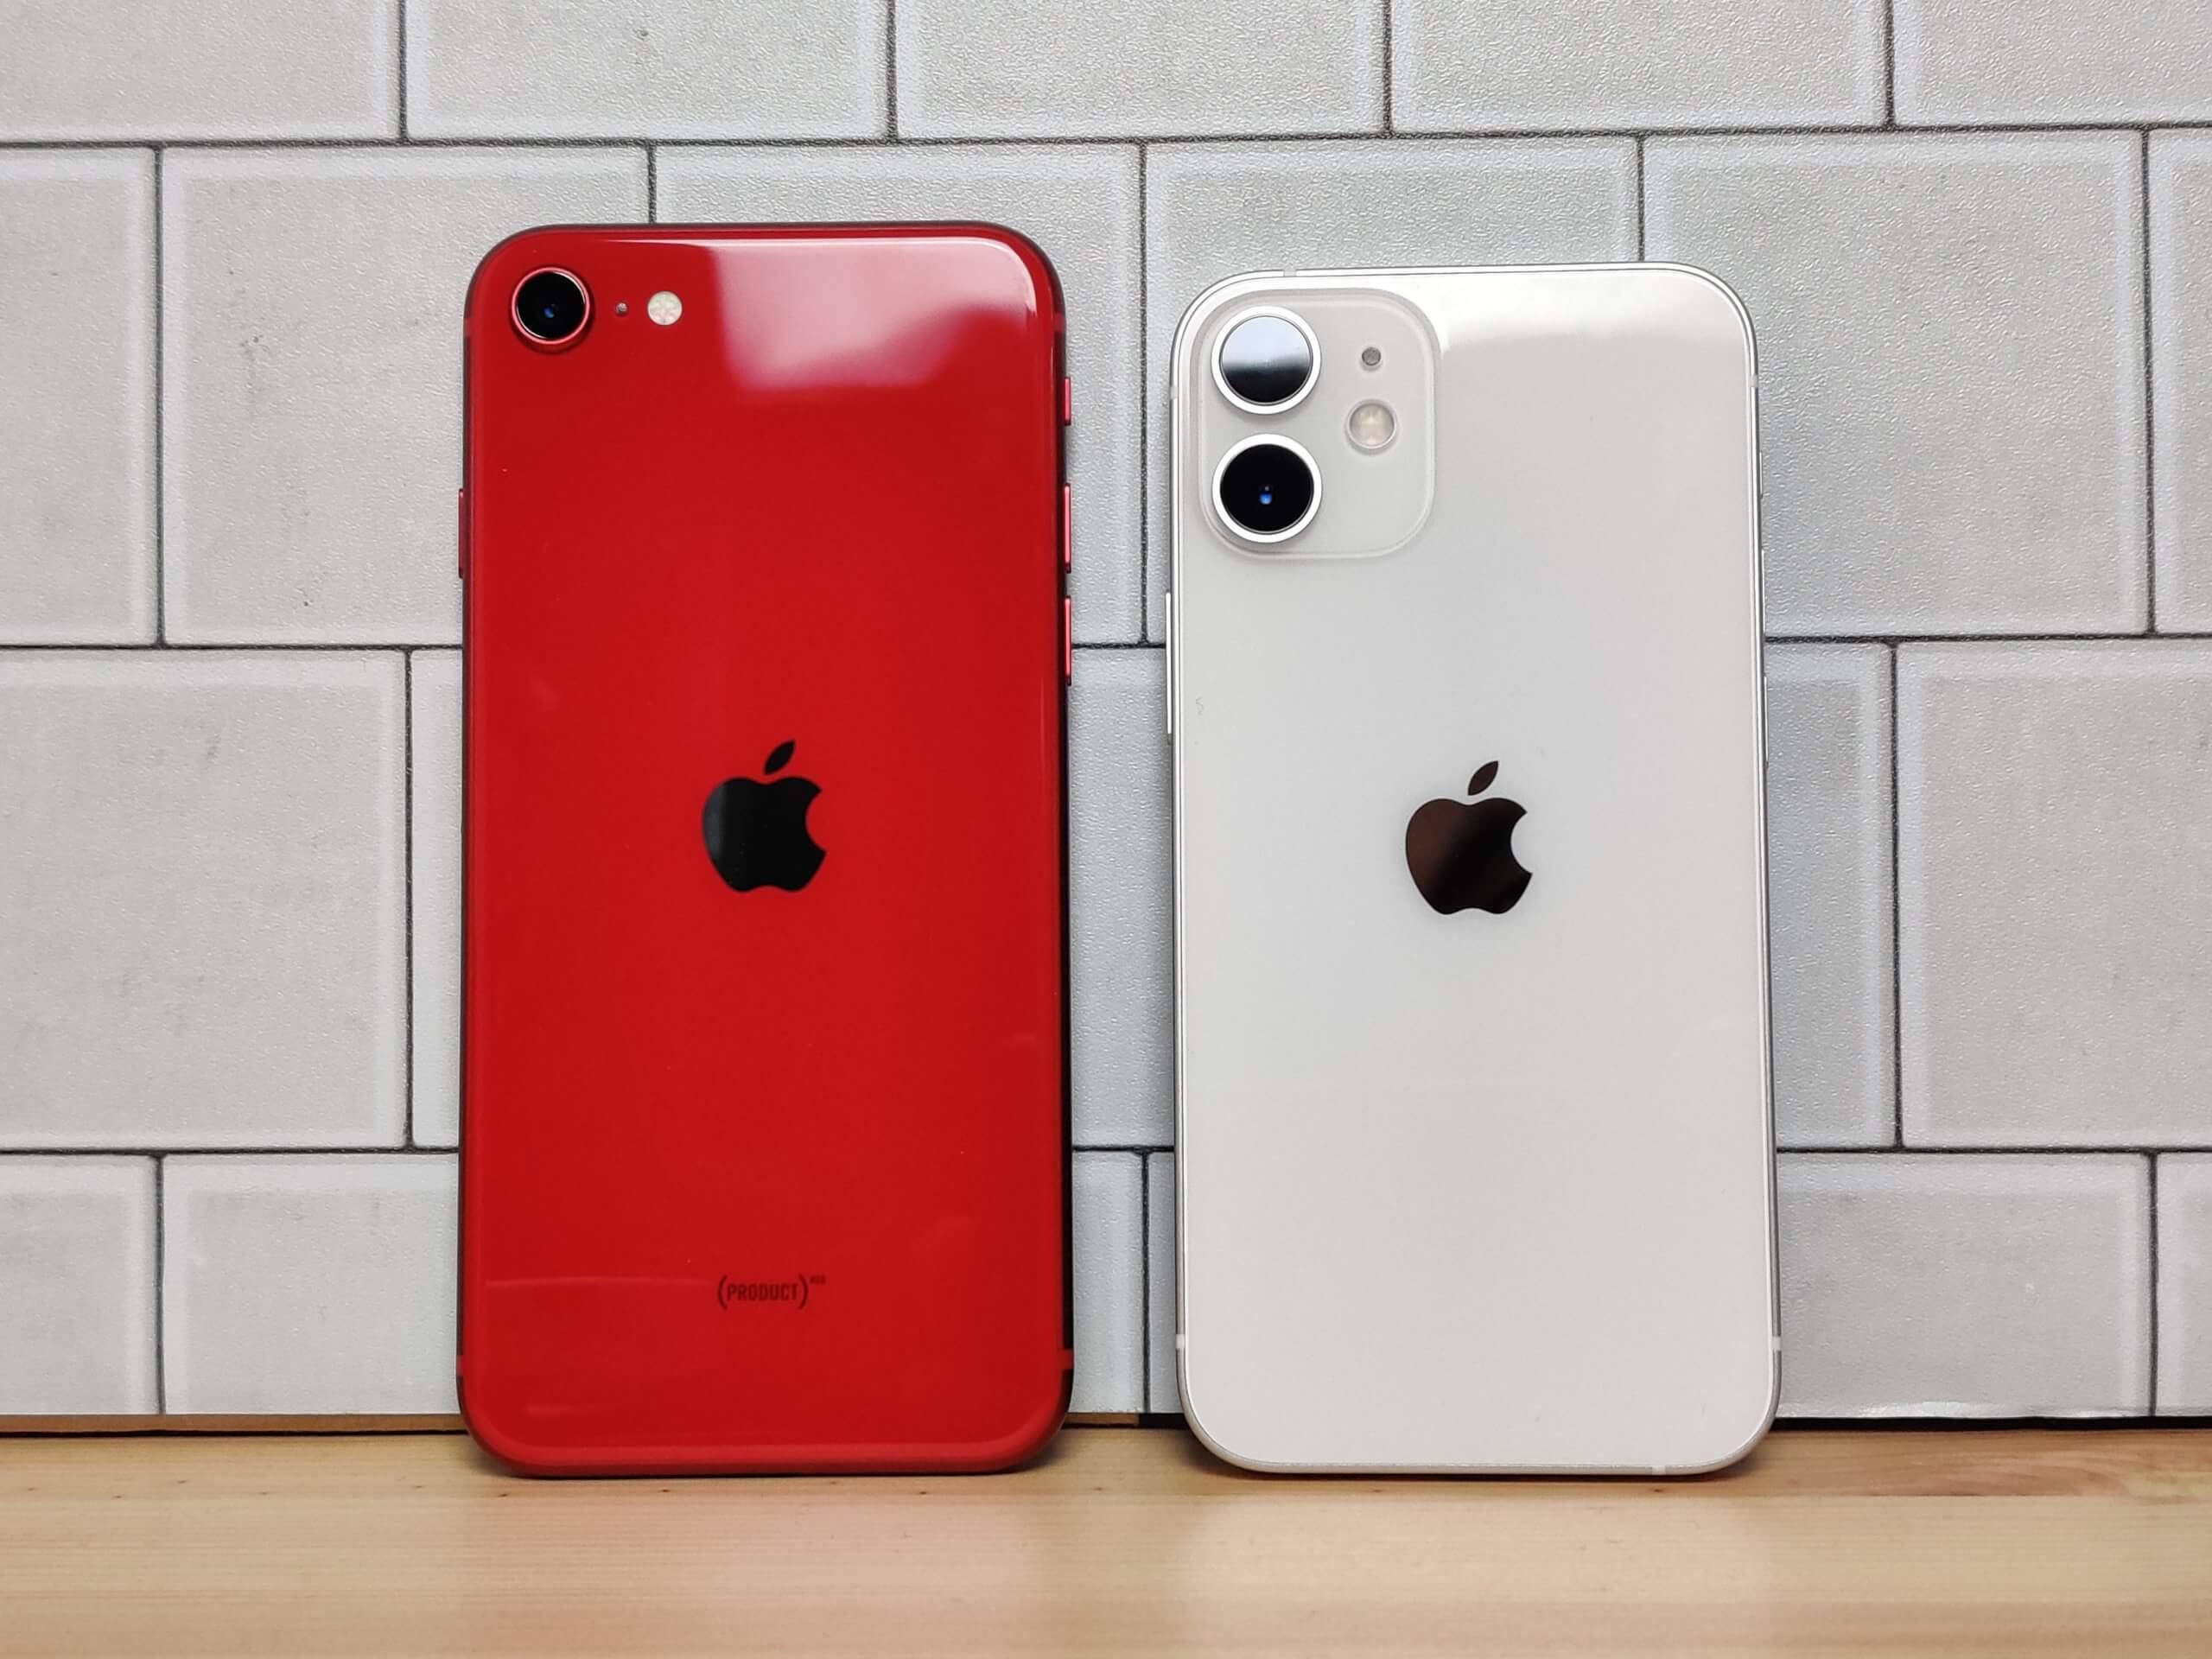 iPhone SE 2ndとiPhone 12 miniのカメラ画質を比較も大差は無し!Apple品質の高さを知る結果に